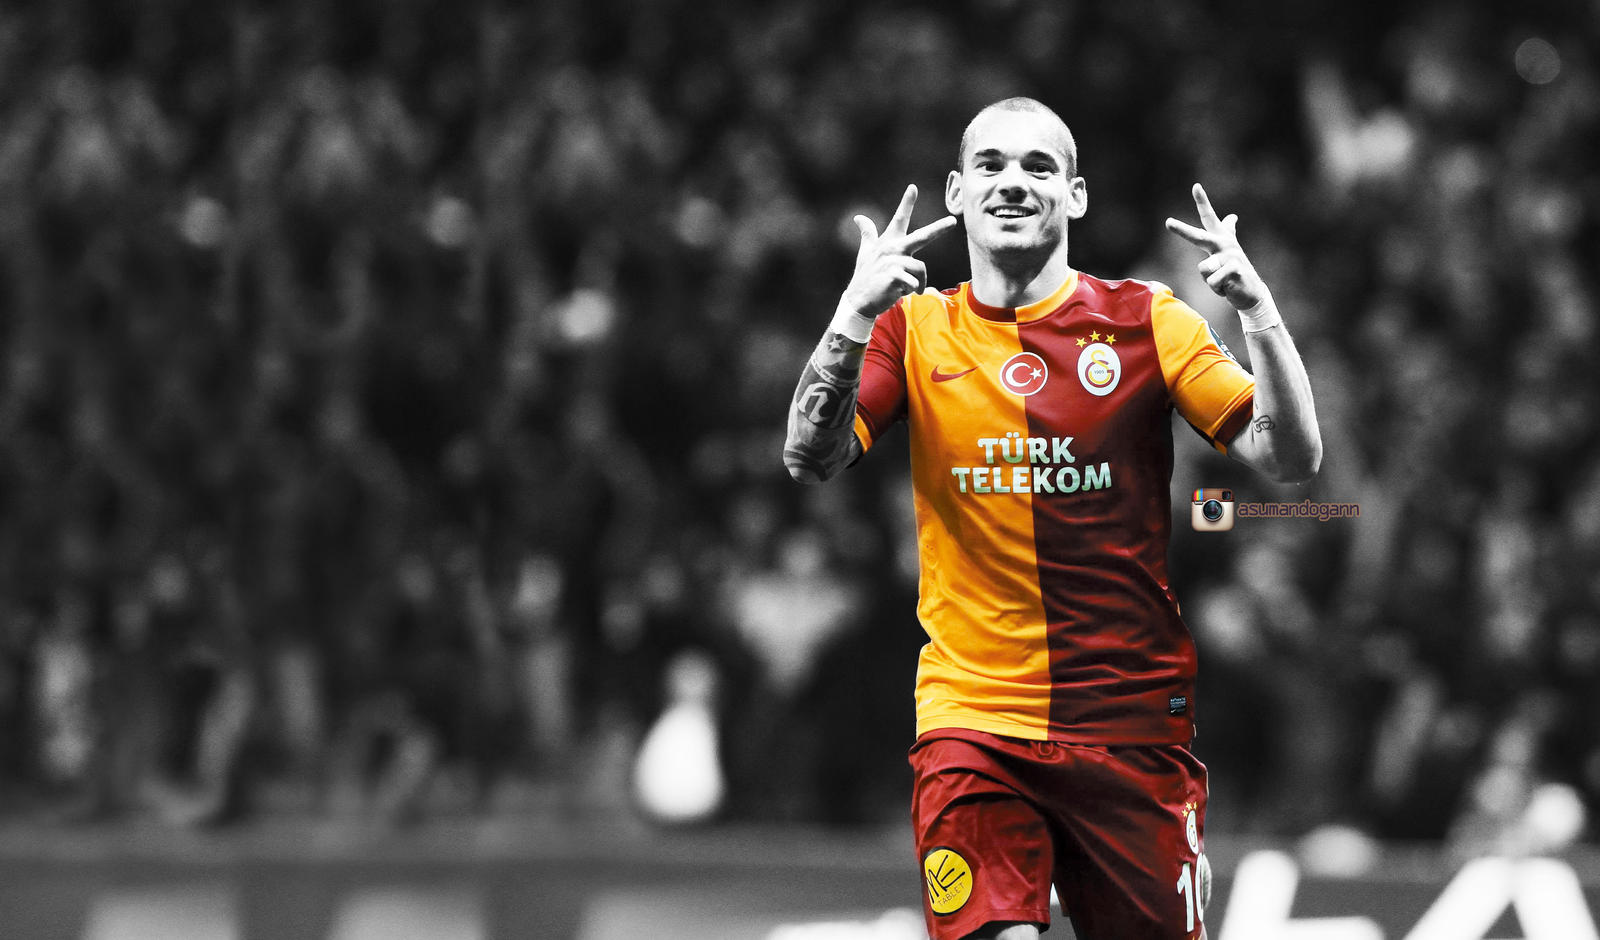 http://fc08.deviantart.net/fs70/i/2014/034/c/b/wesley_sneijder___galatasaray_by_asumandogan-d74x36m.jpg